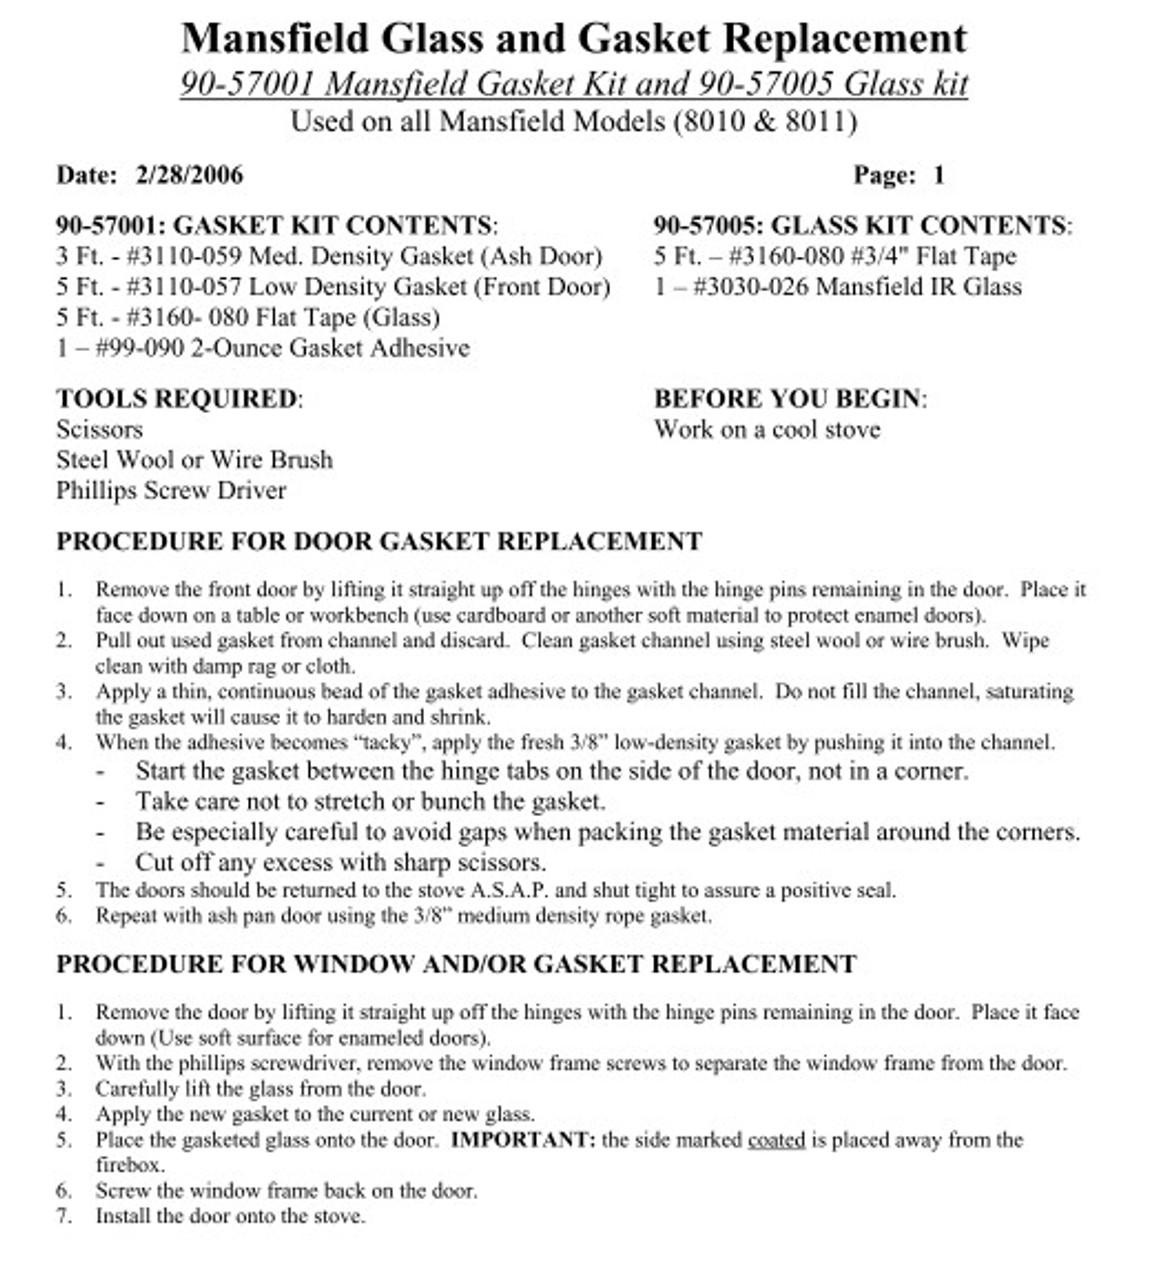 HearthStone Mansfield Gasket Kit 90-57001